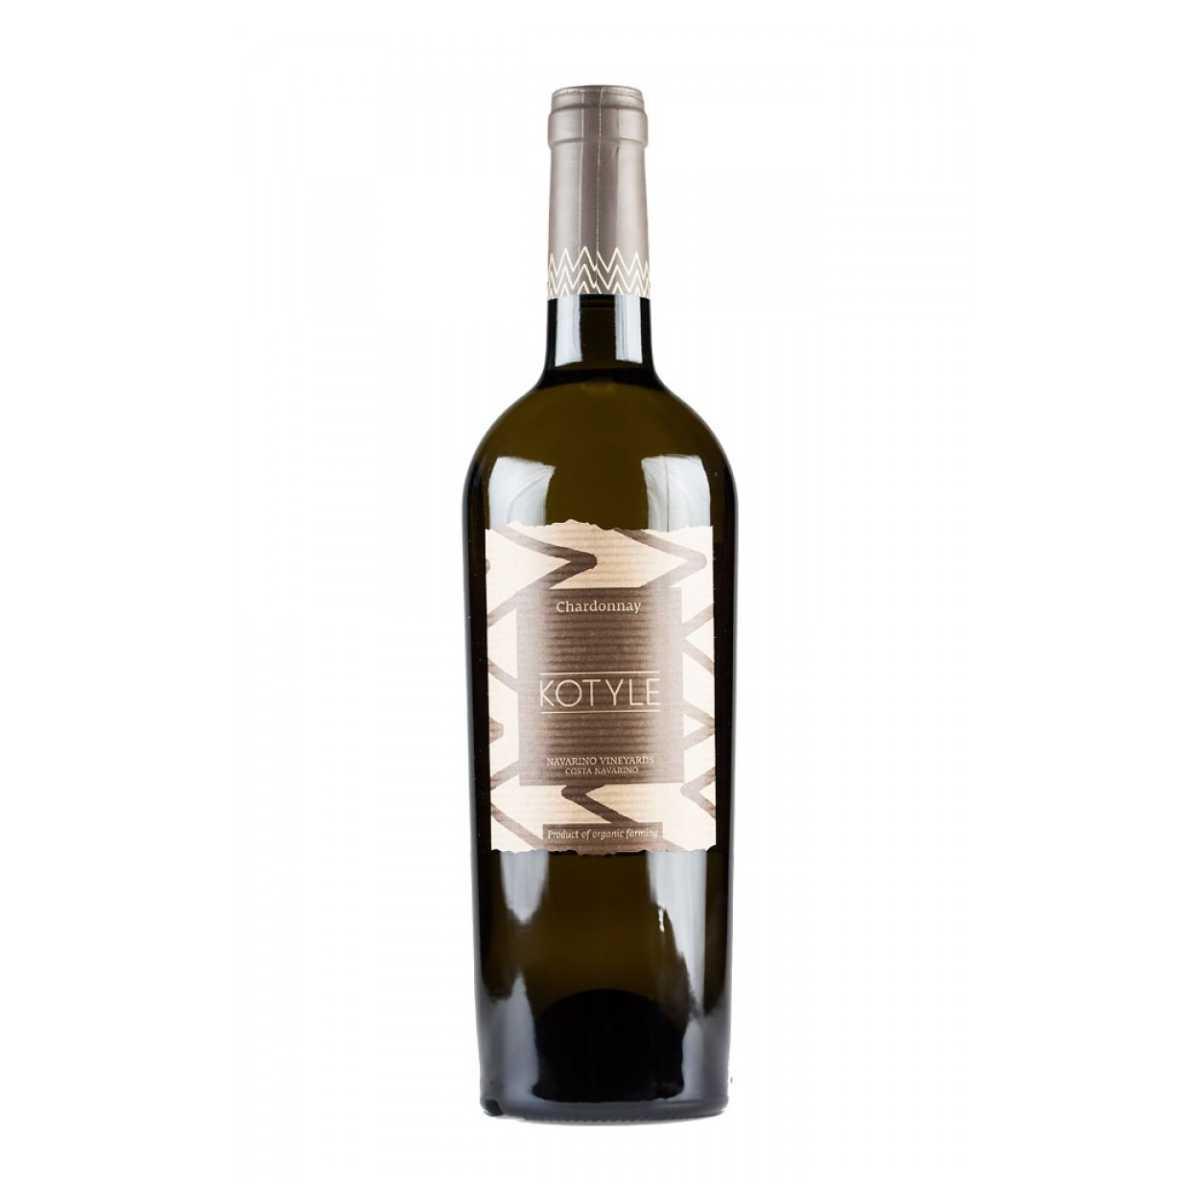 Kotyle Chardonnay